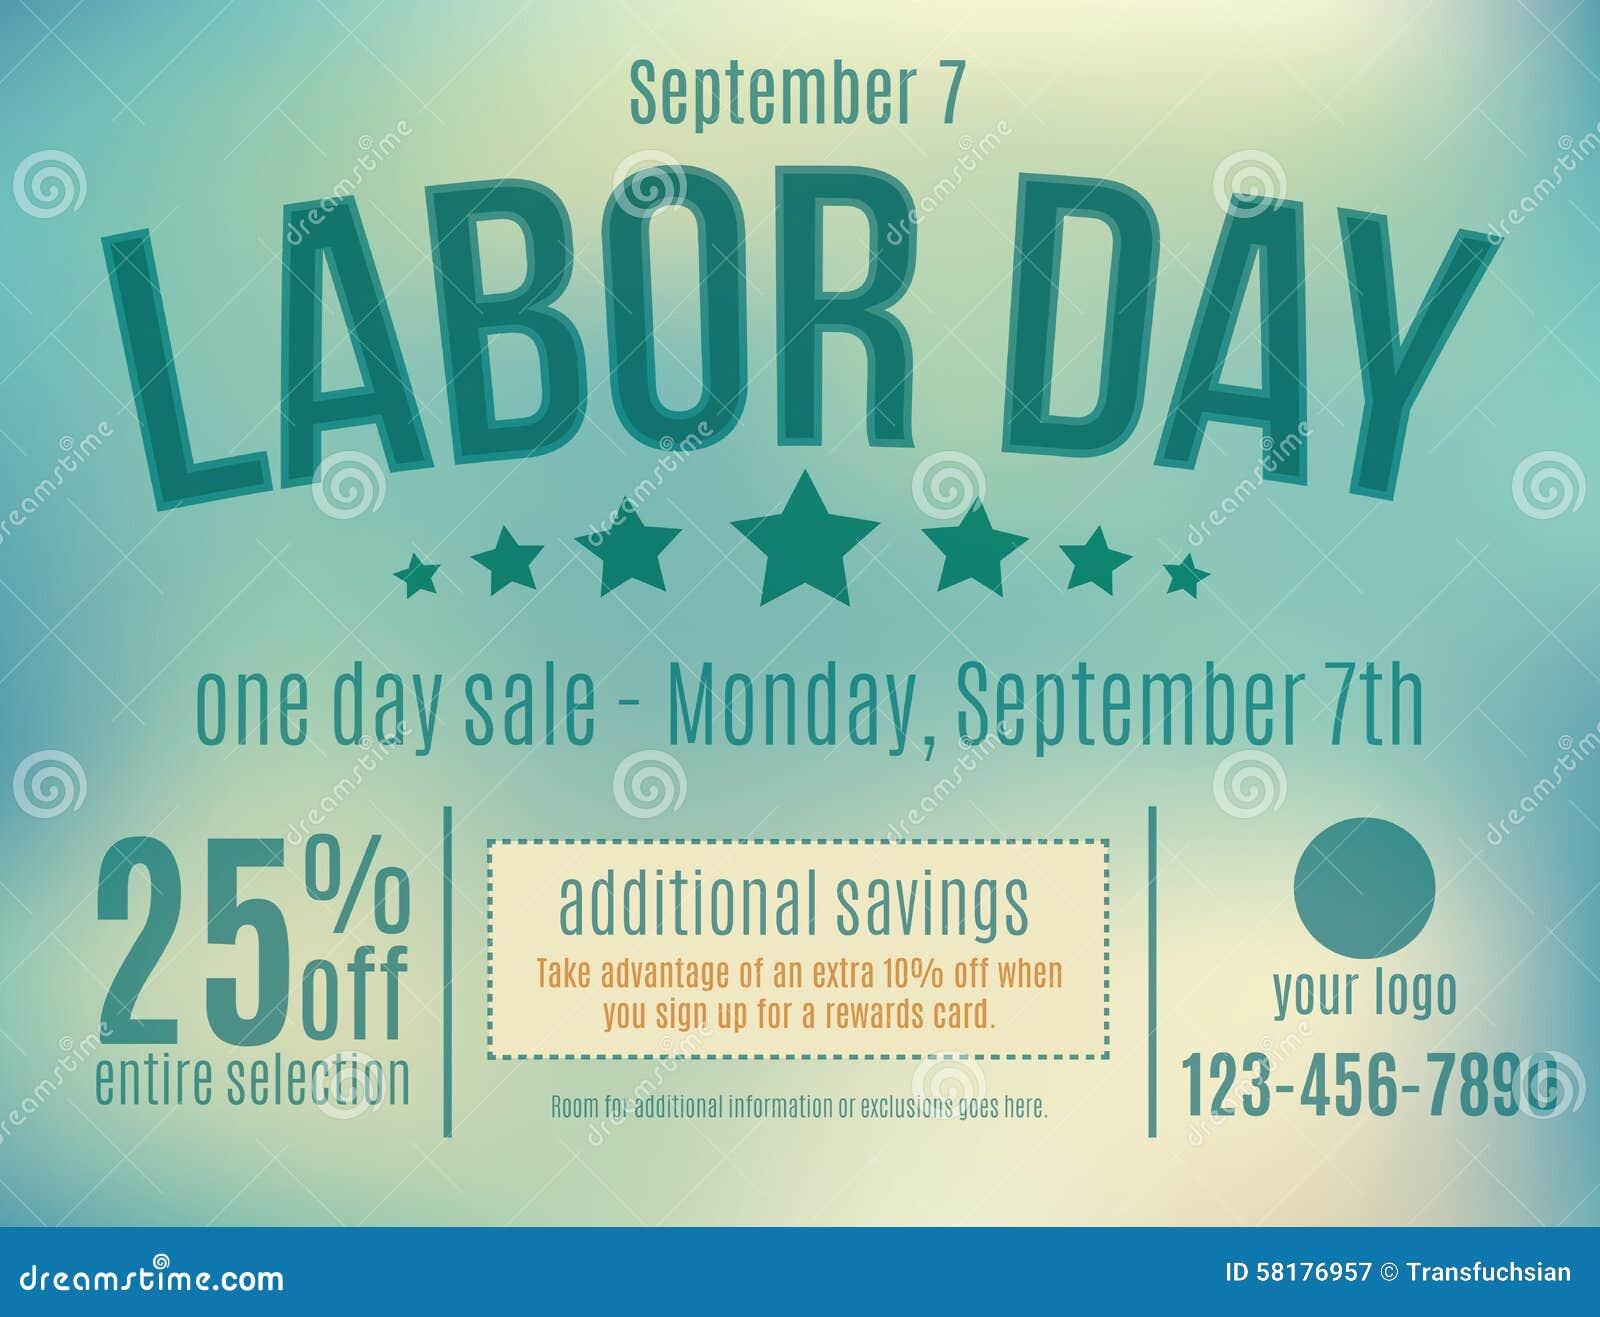 Labor Day Sale Postcard Stock Vector - Image: 58176957